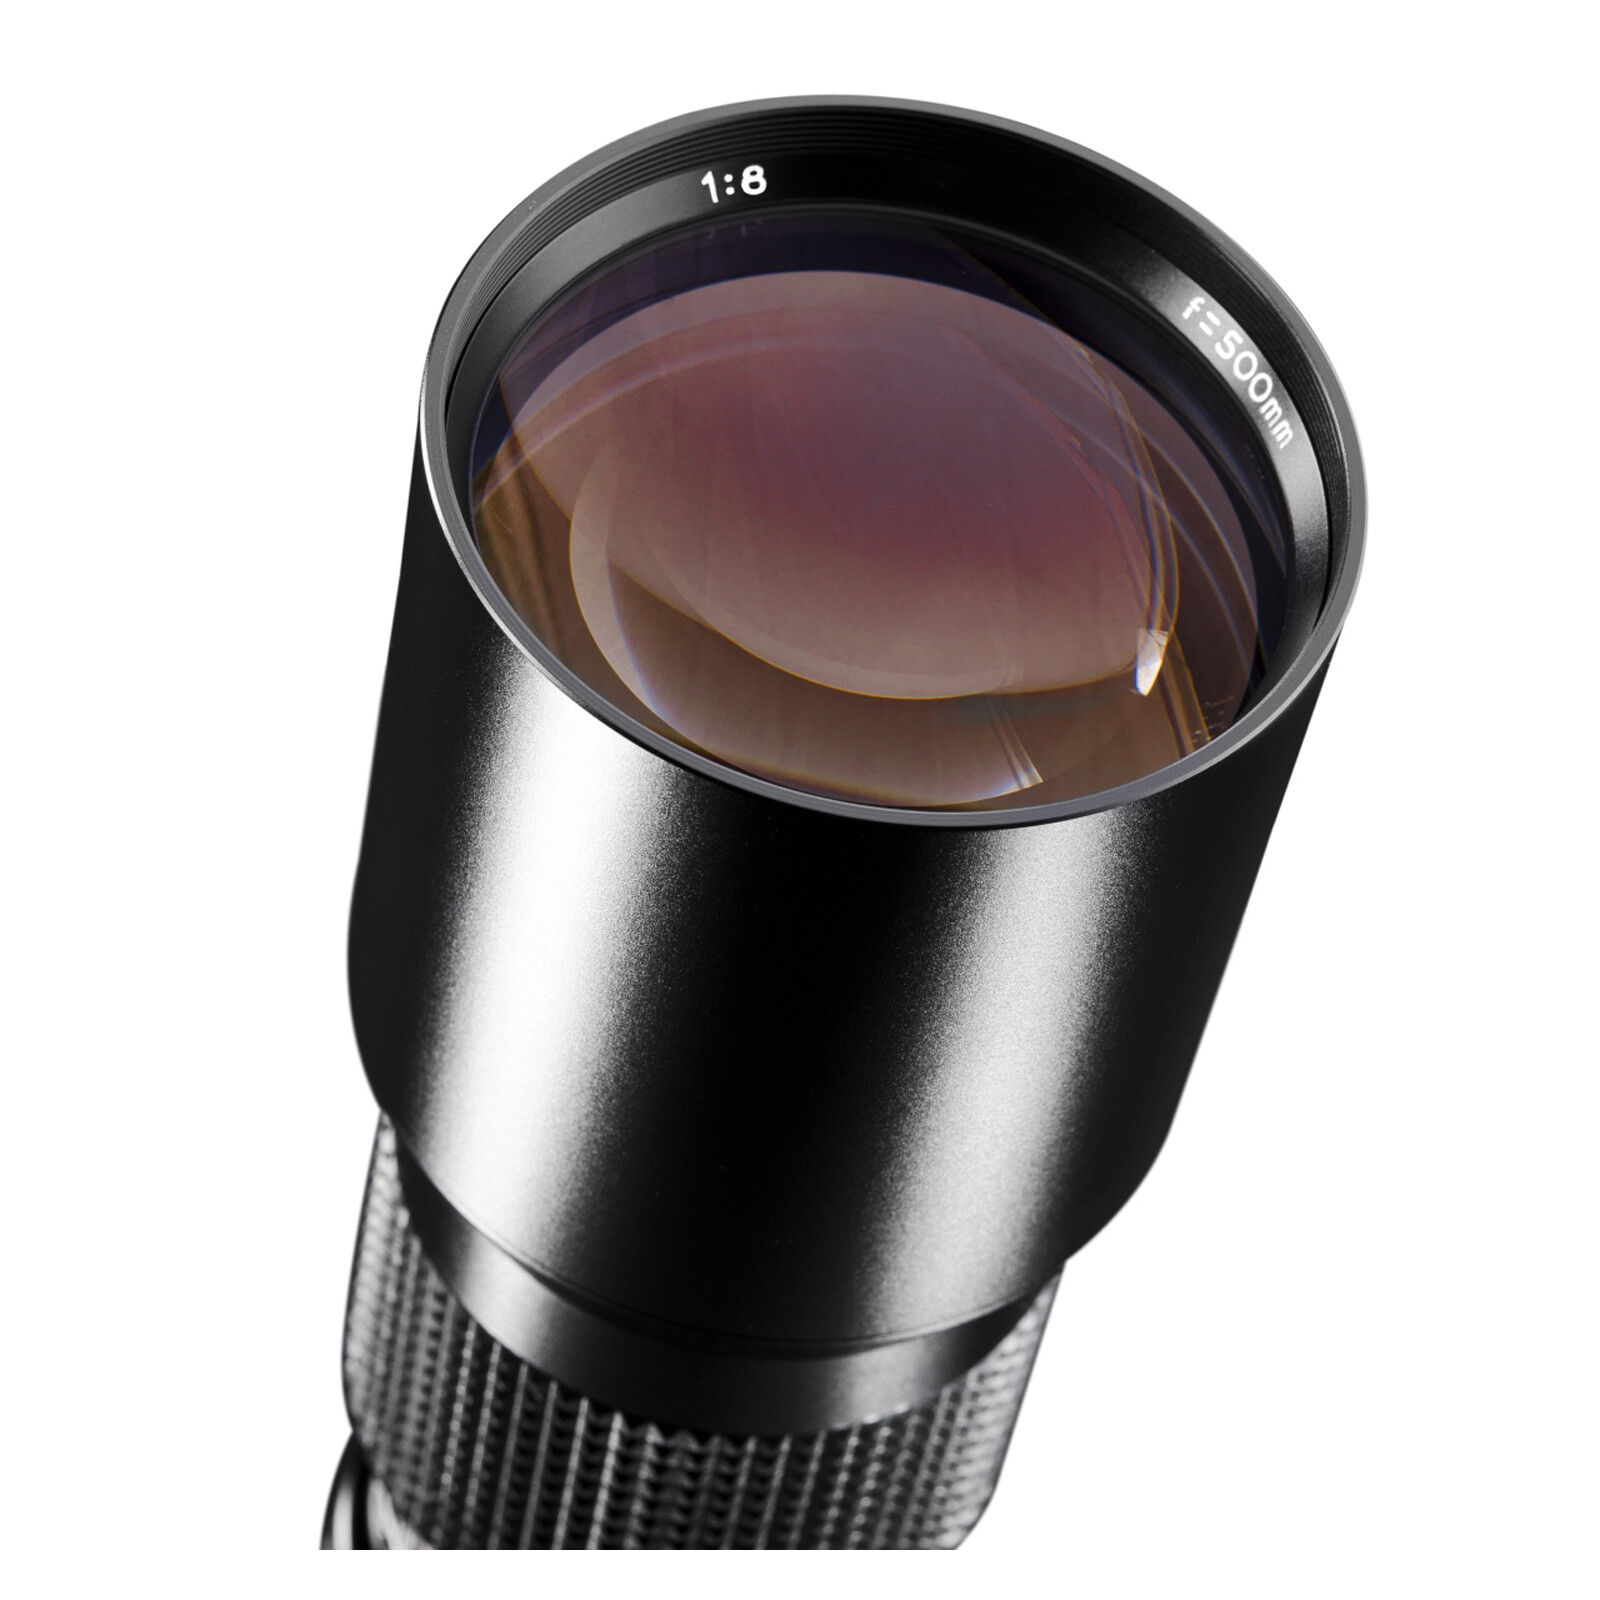 walimex 500/8,0 DSLR M42 Schwarz